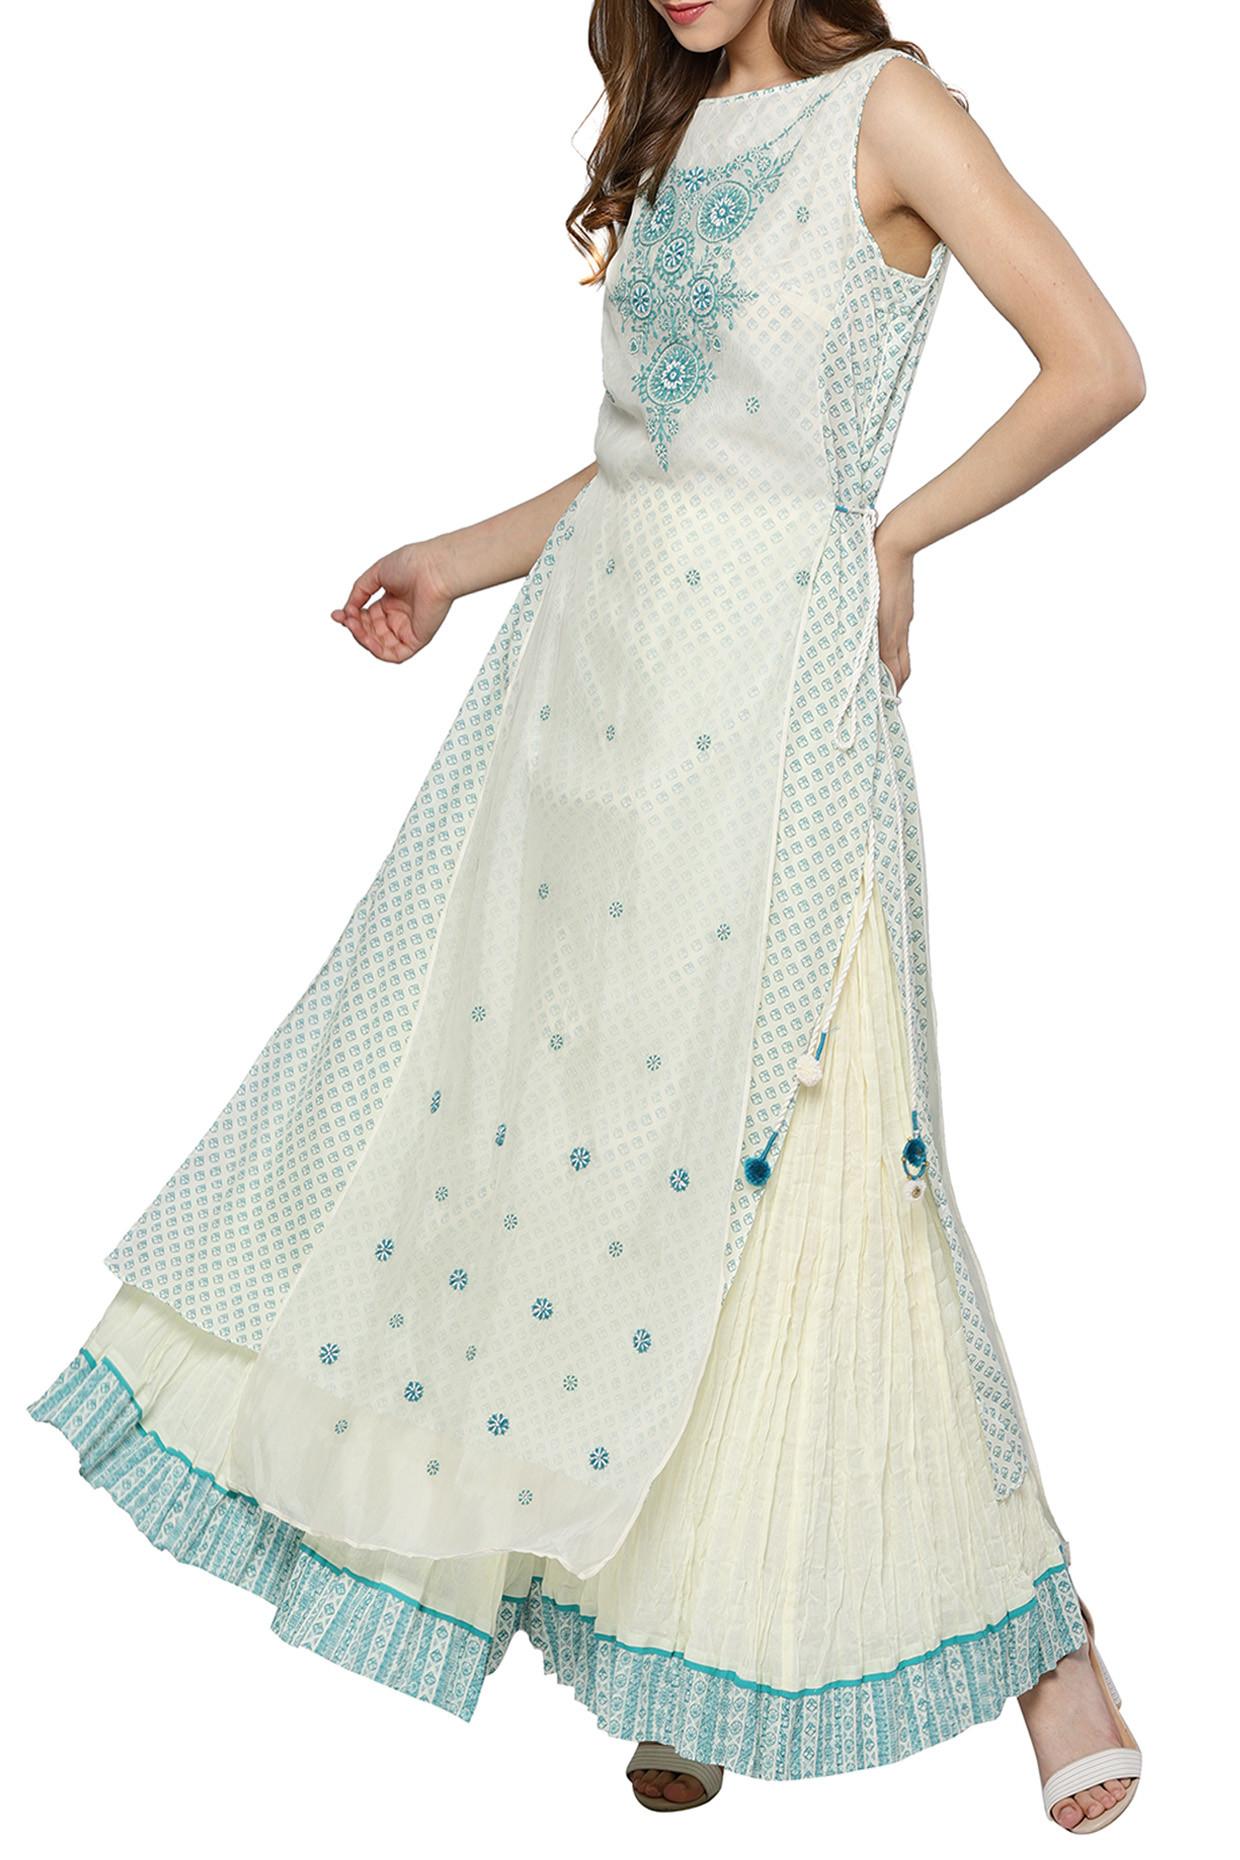 White & Blue Embroidered Printed Kurta With Skirt by Ritu Kumar